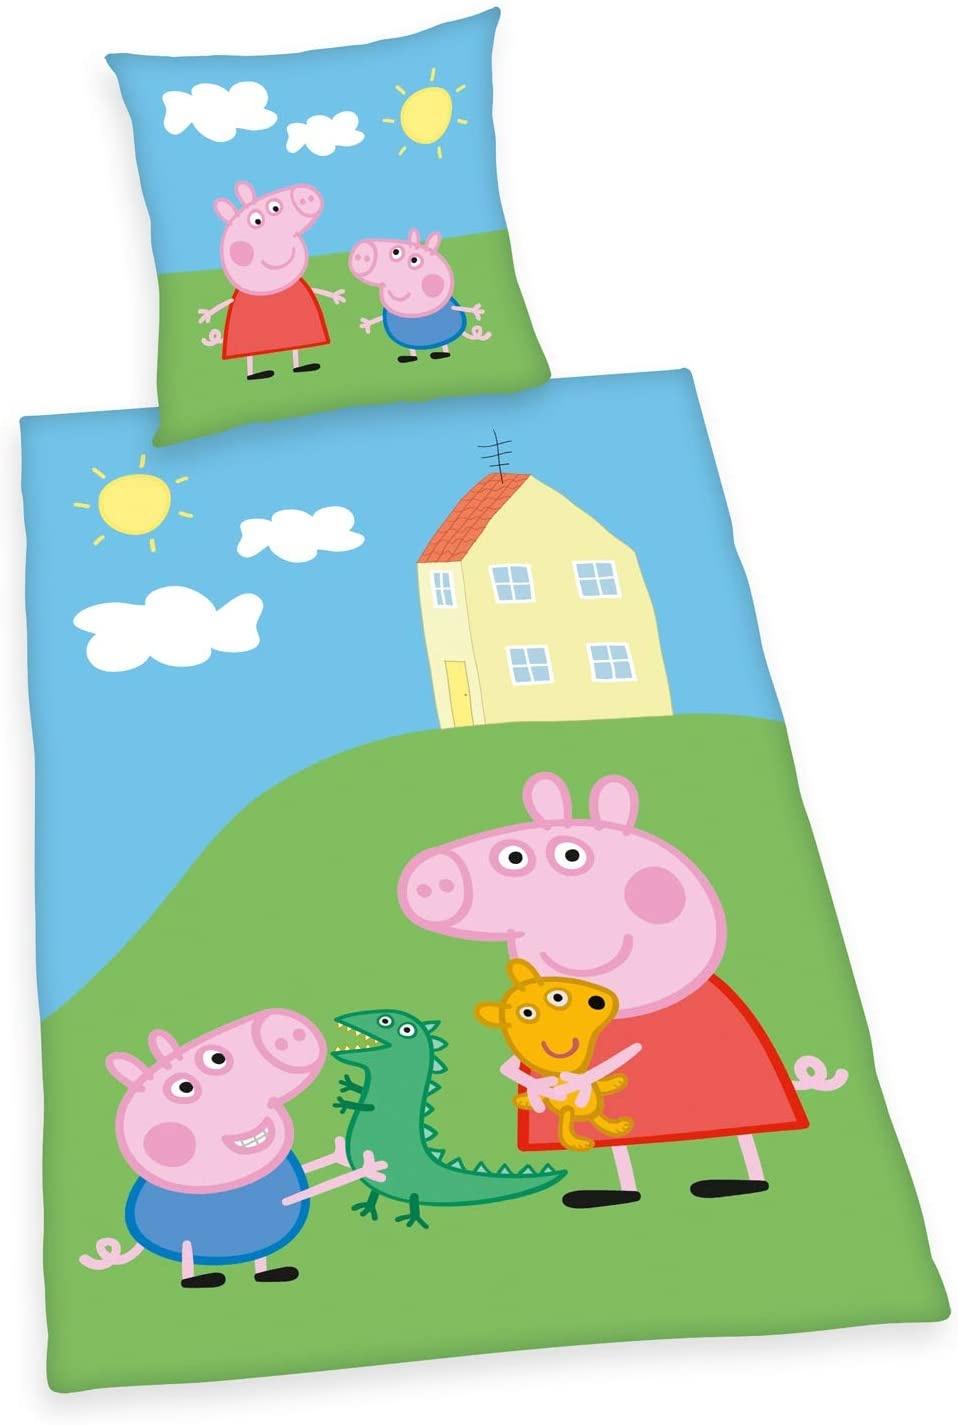 Peppa Pig Peppa Pig Dekbedovertrek 140x200 Katoen GroteKussensloop 70x90cm